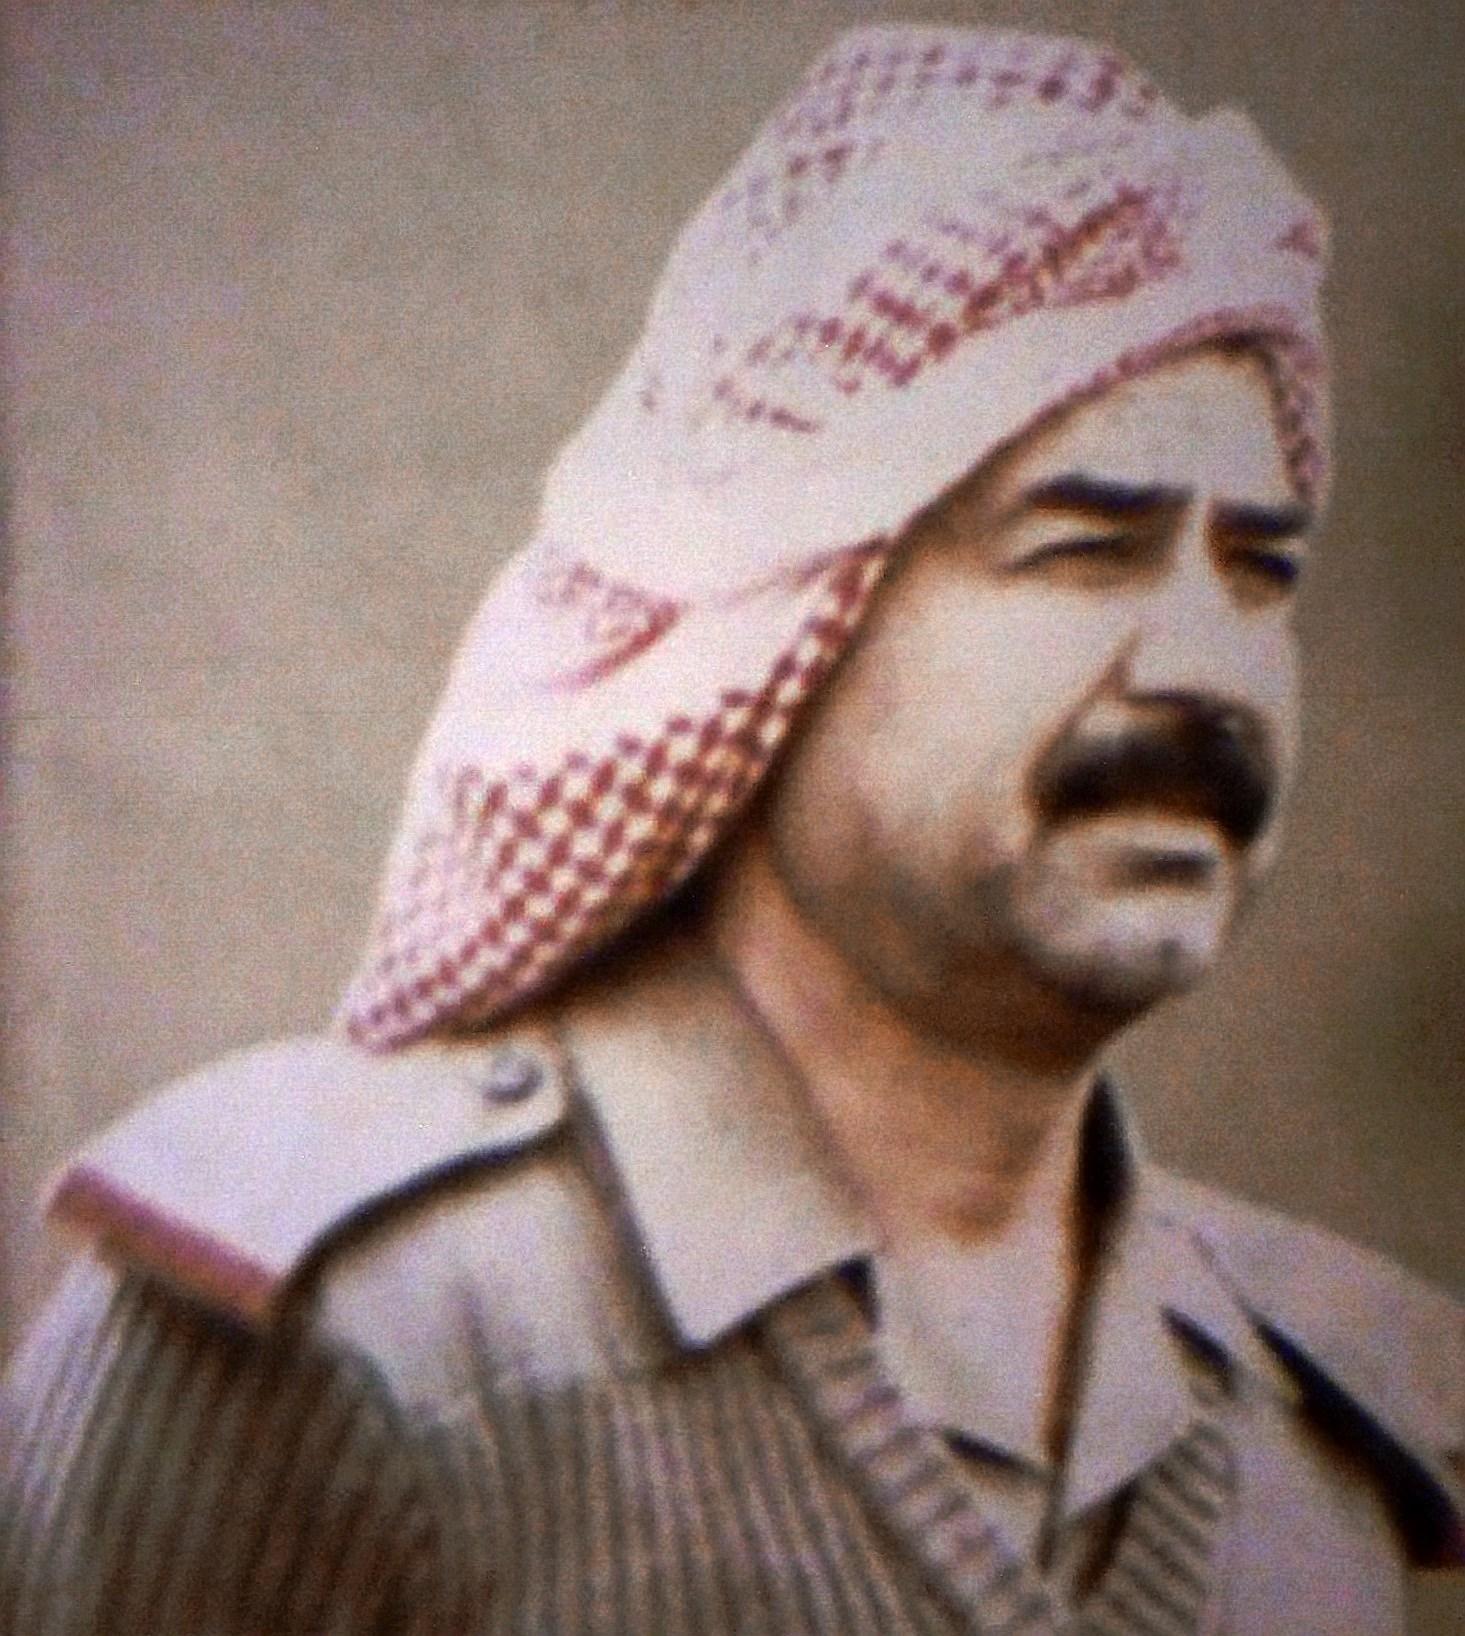 https://i2.wp.com/upload.wikimedia.org/wikipedia/commons/c/cf/Saddam_Hussein_1982.jpg